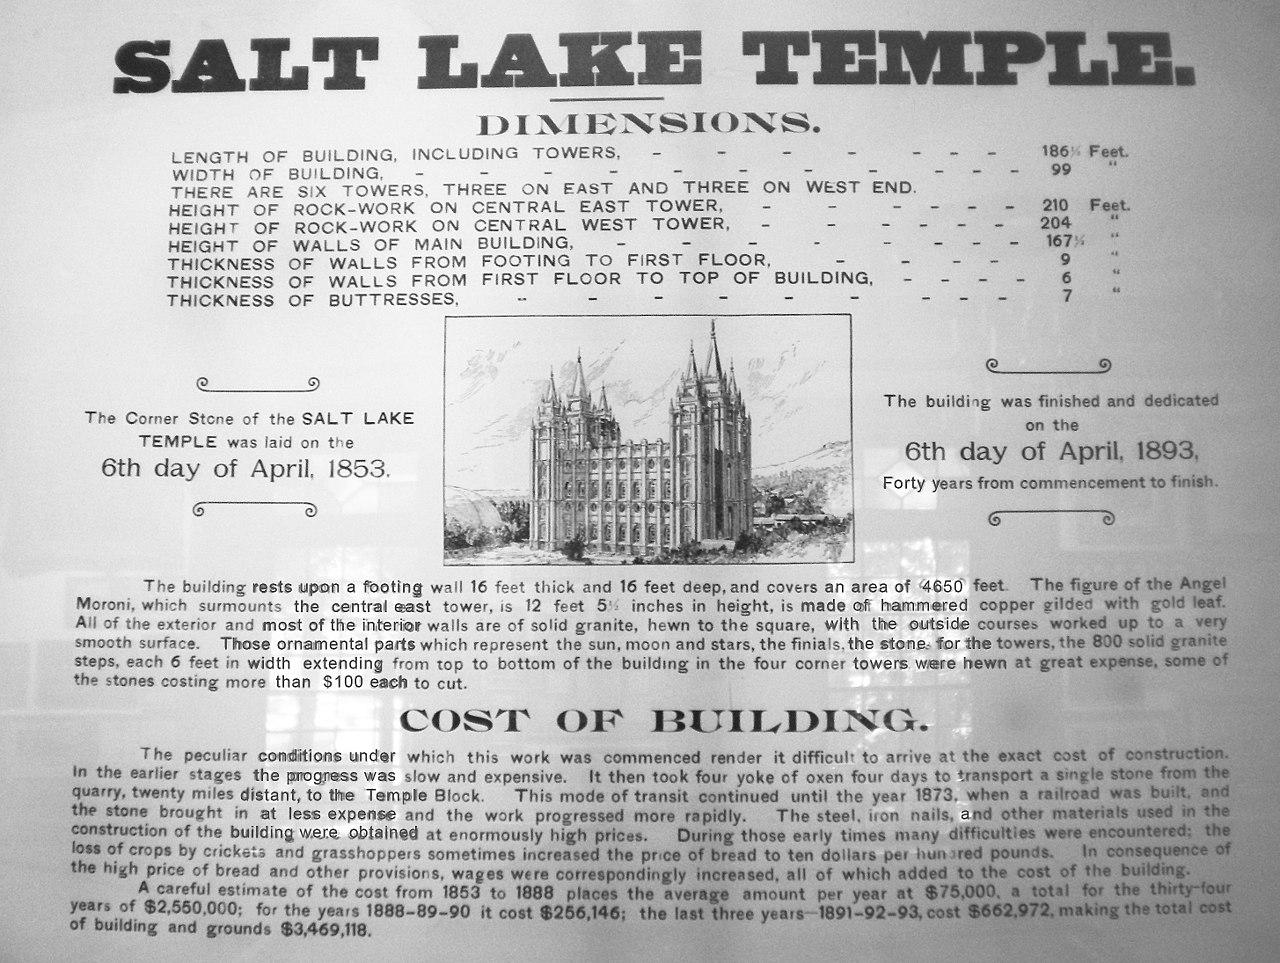 Salt late city law history essay